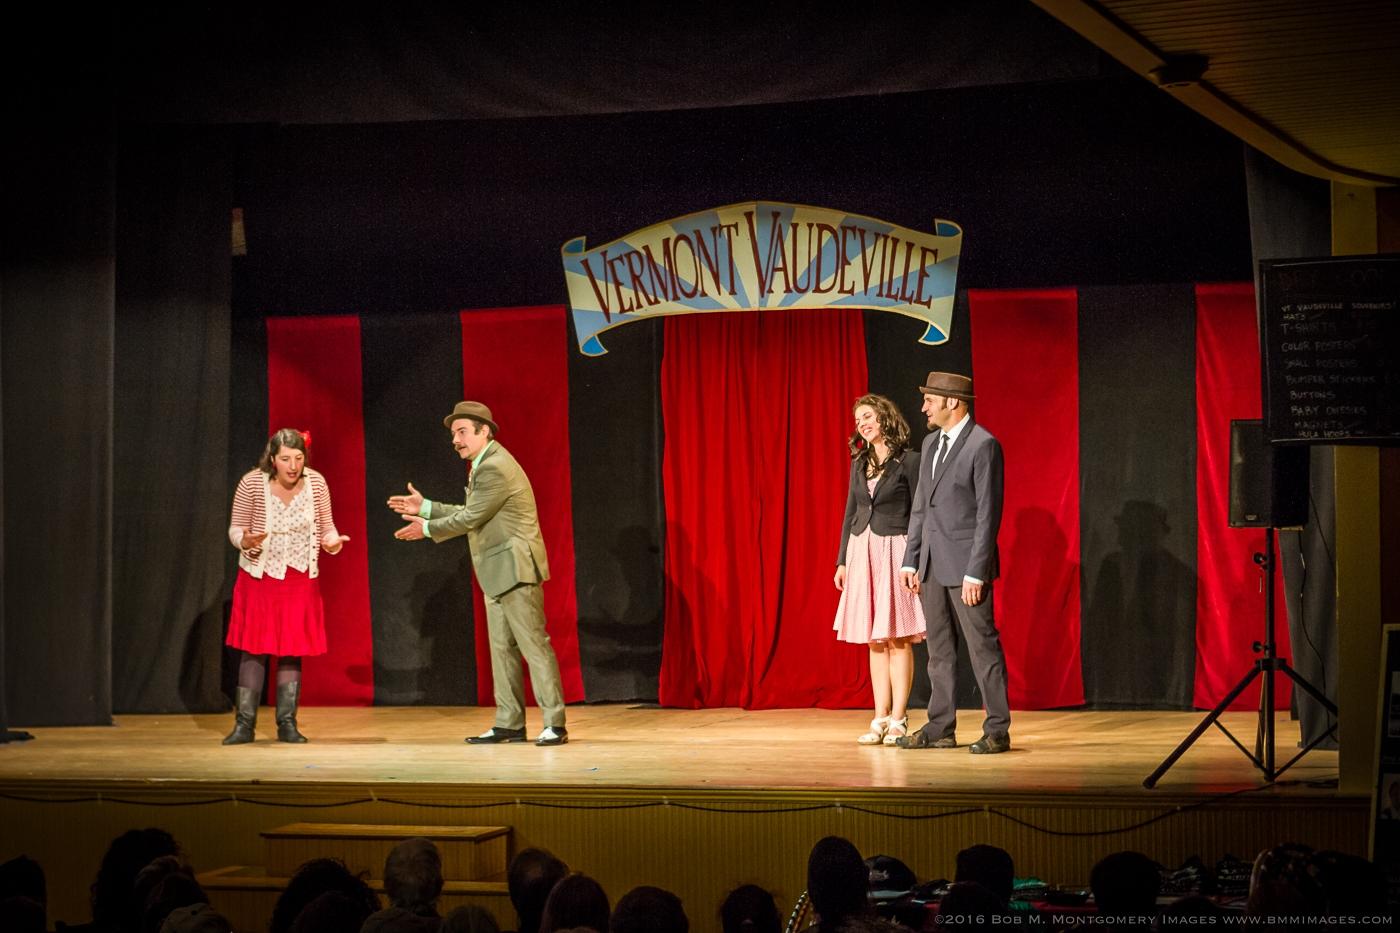 Vermont Vaudeville 20160513 - 0033.jpg